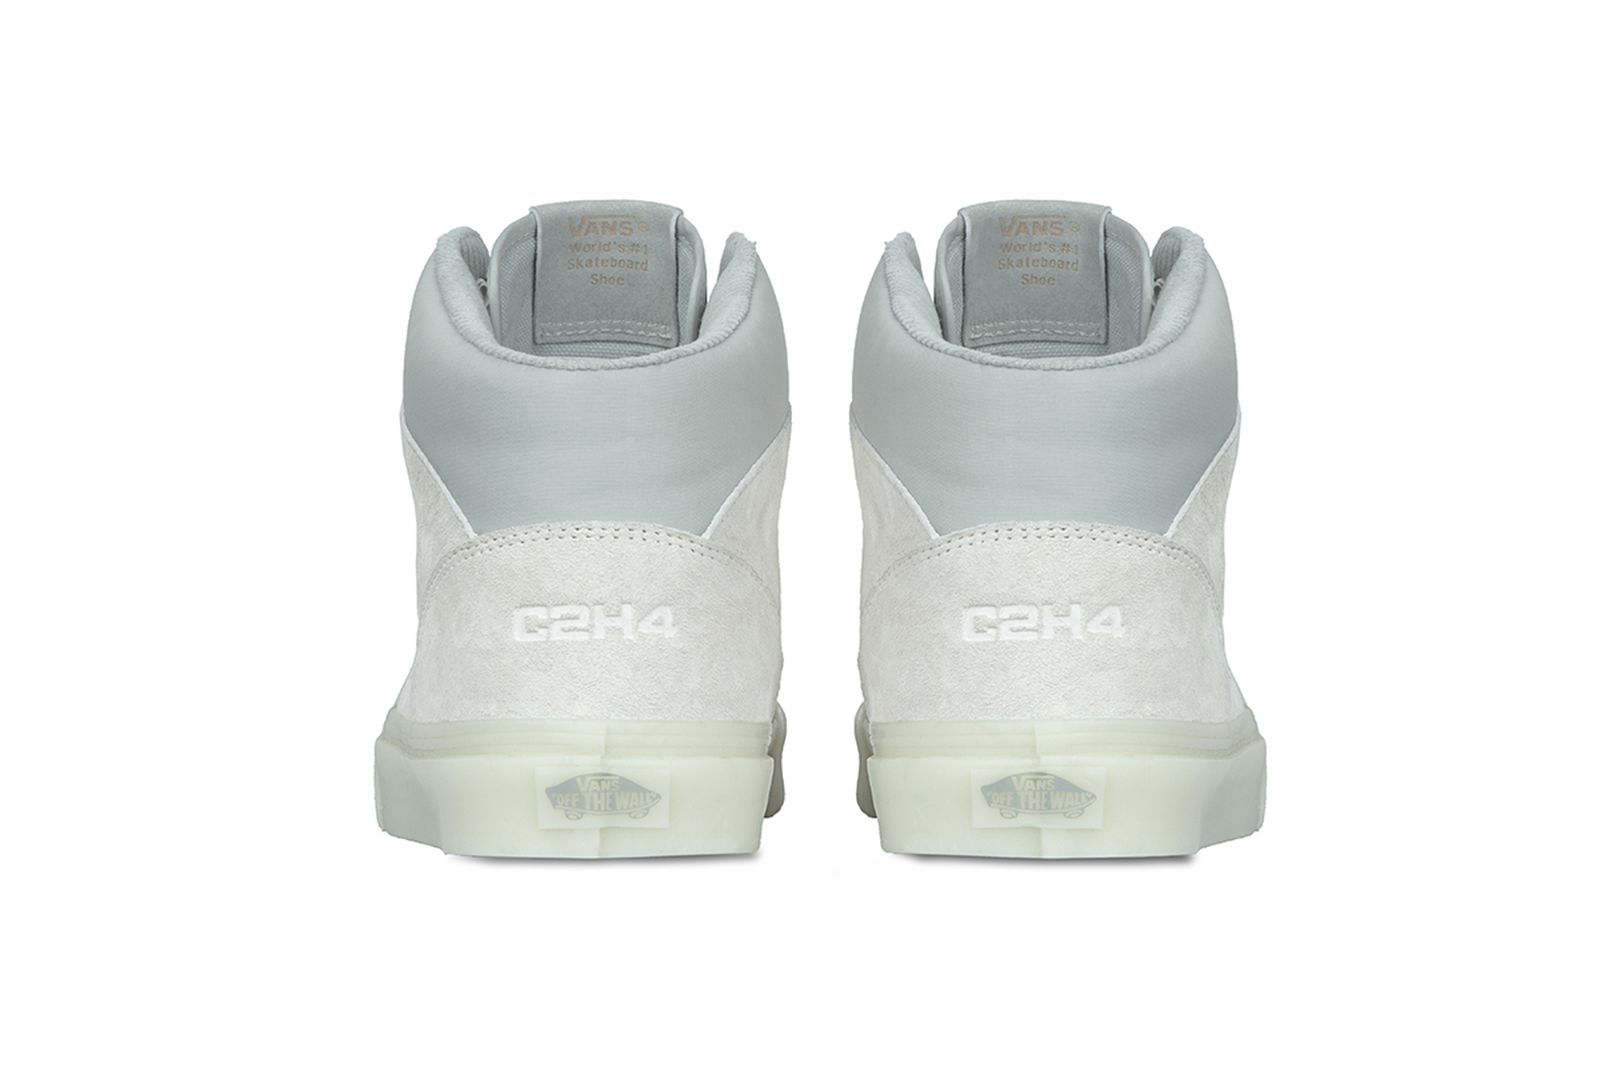 c2h4-vans-the-imagination-of-future-2-release-date-price-1-06